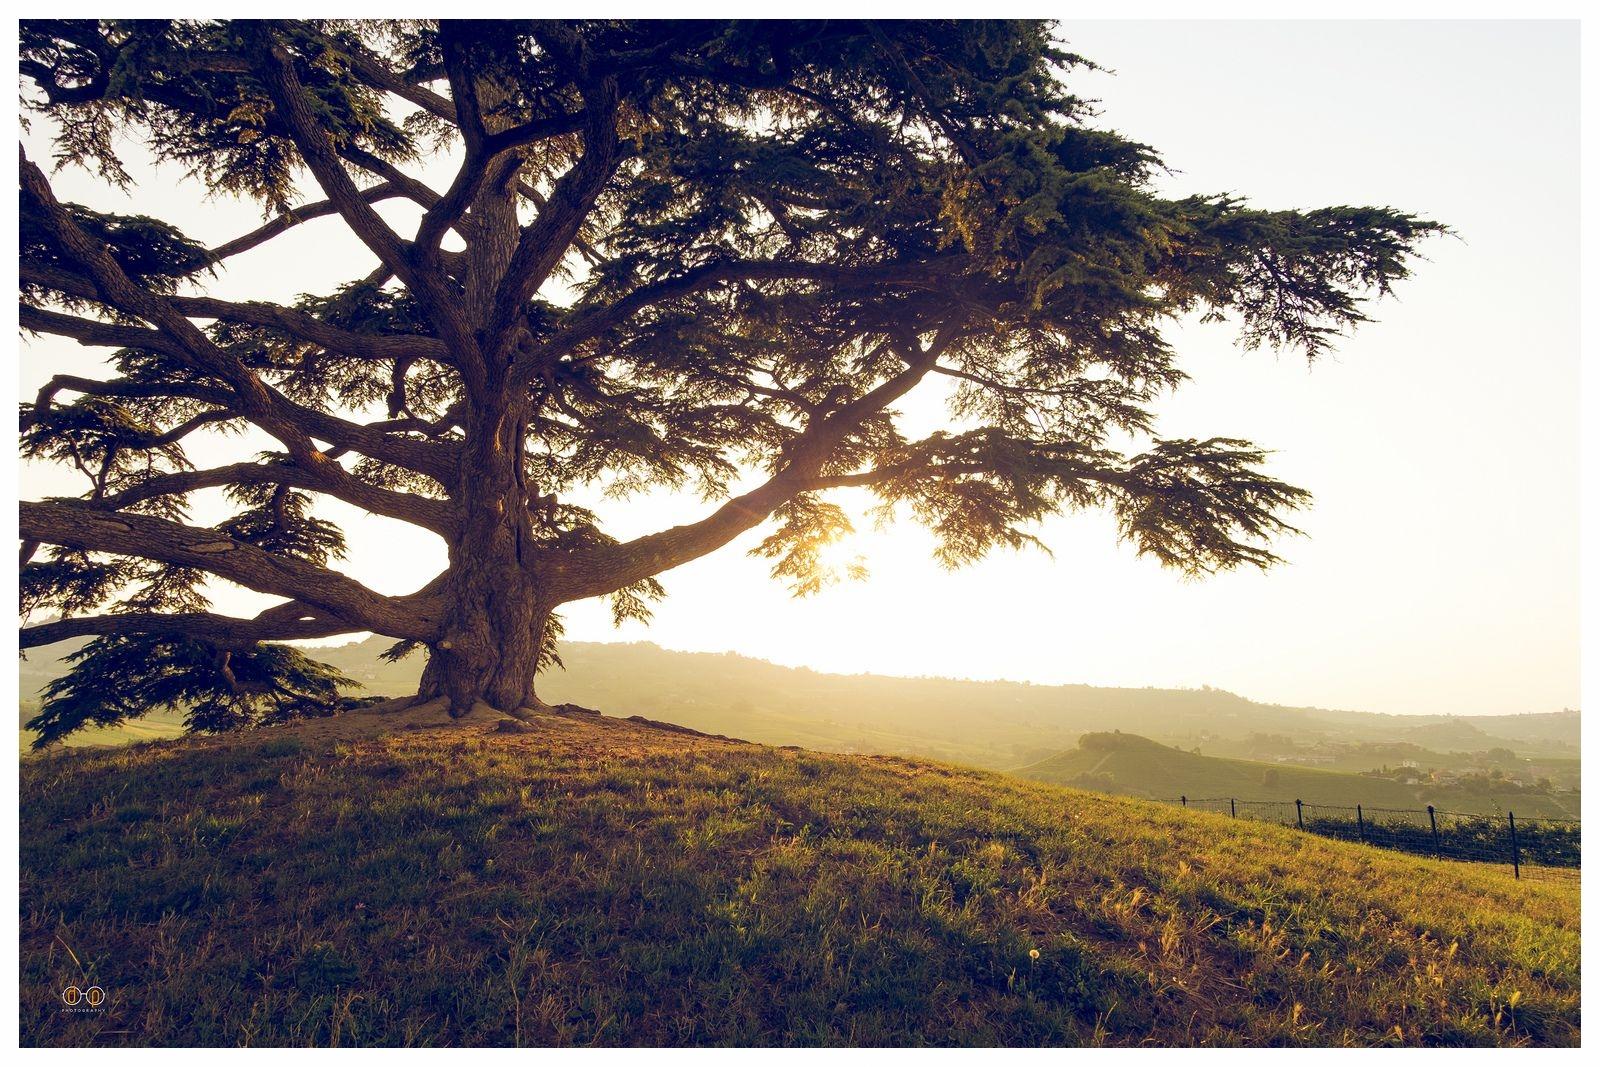 il cedro del libano langhe la morra.jpg